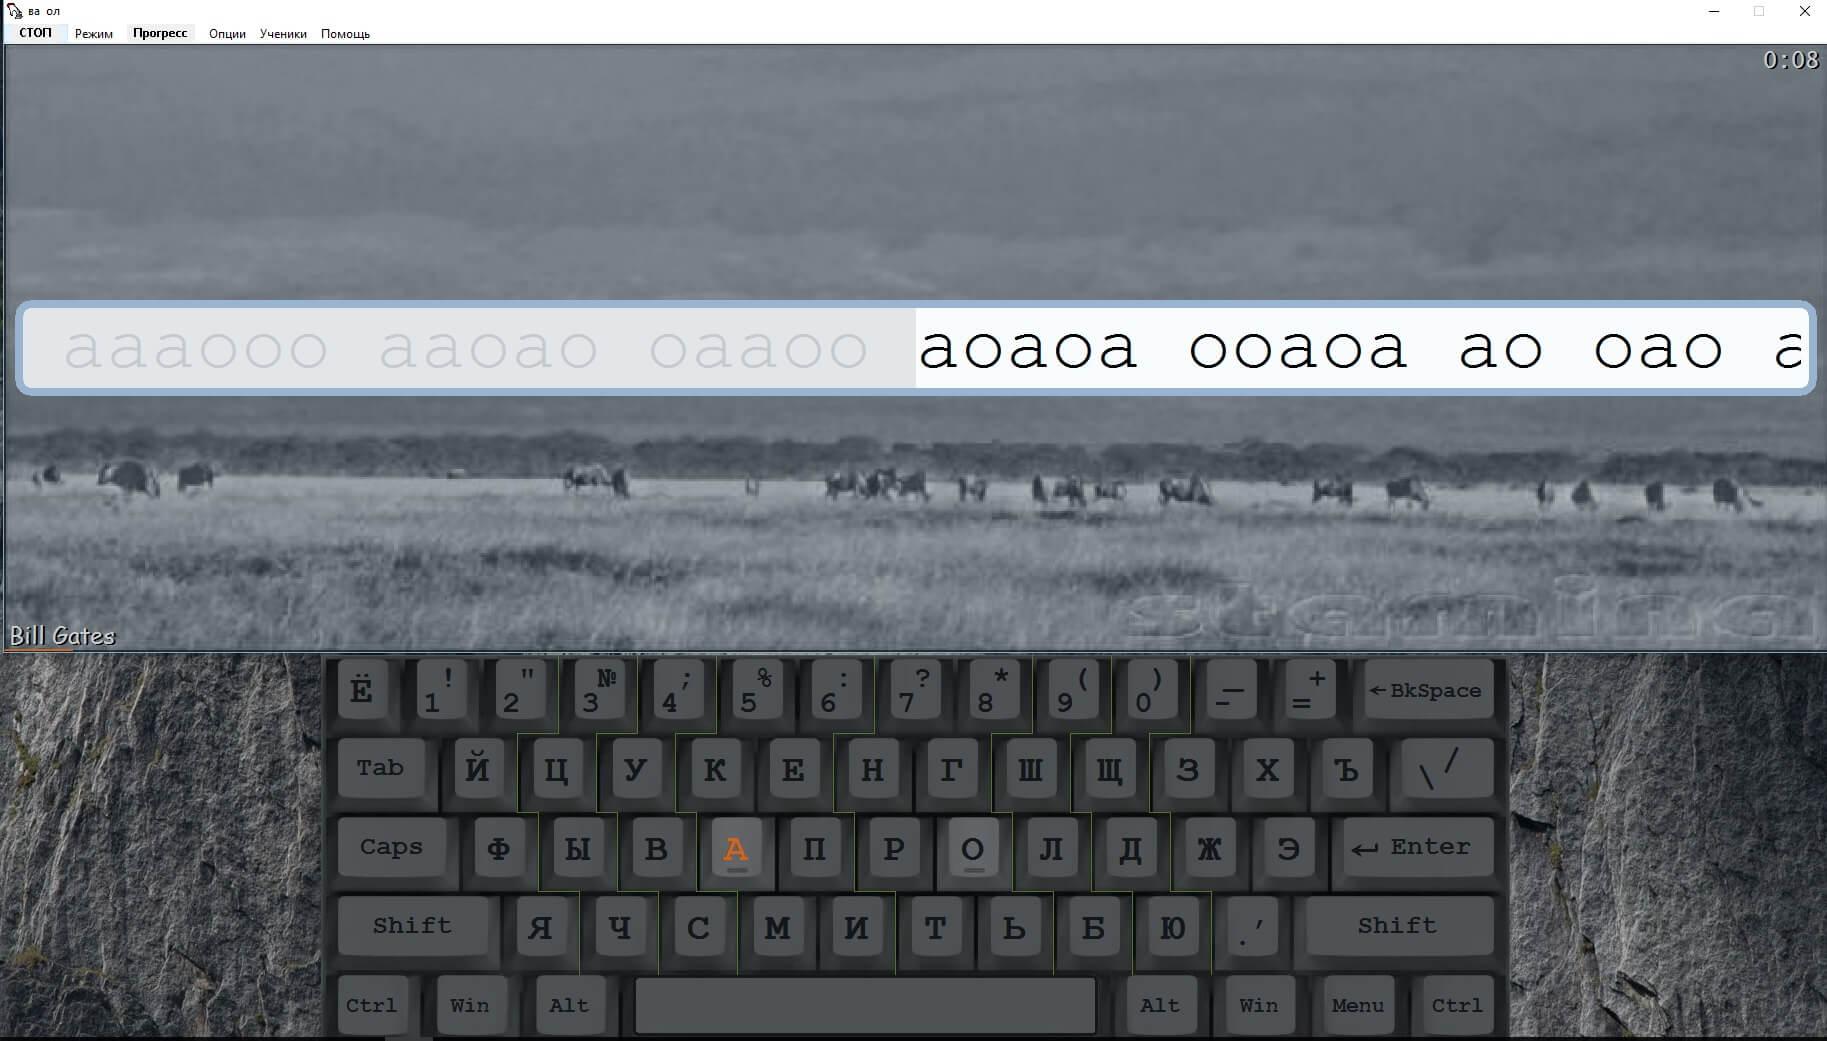 Скриншот клавиатурного тренажера Стамина